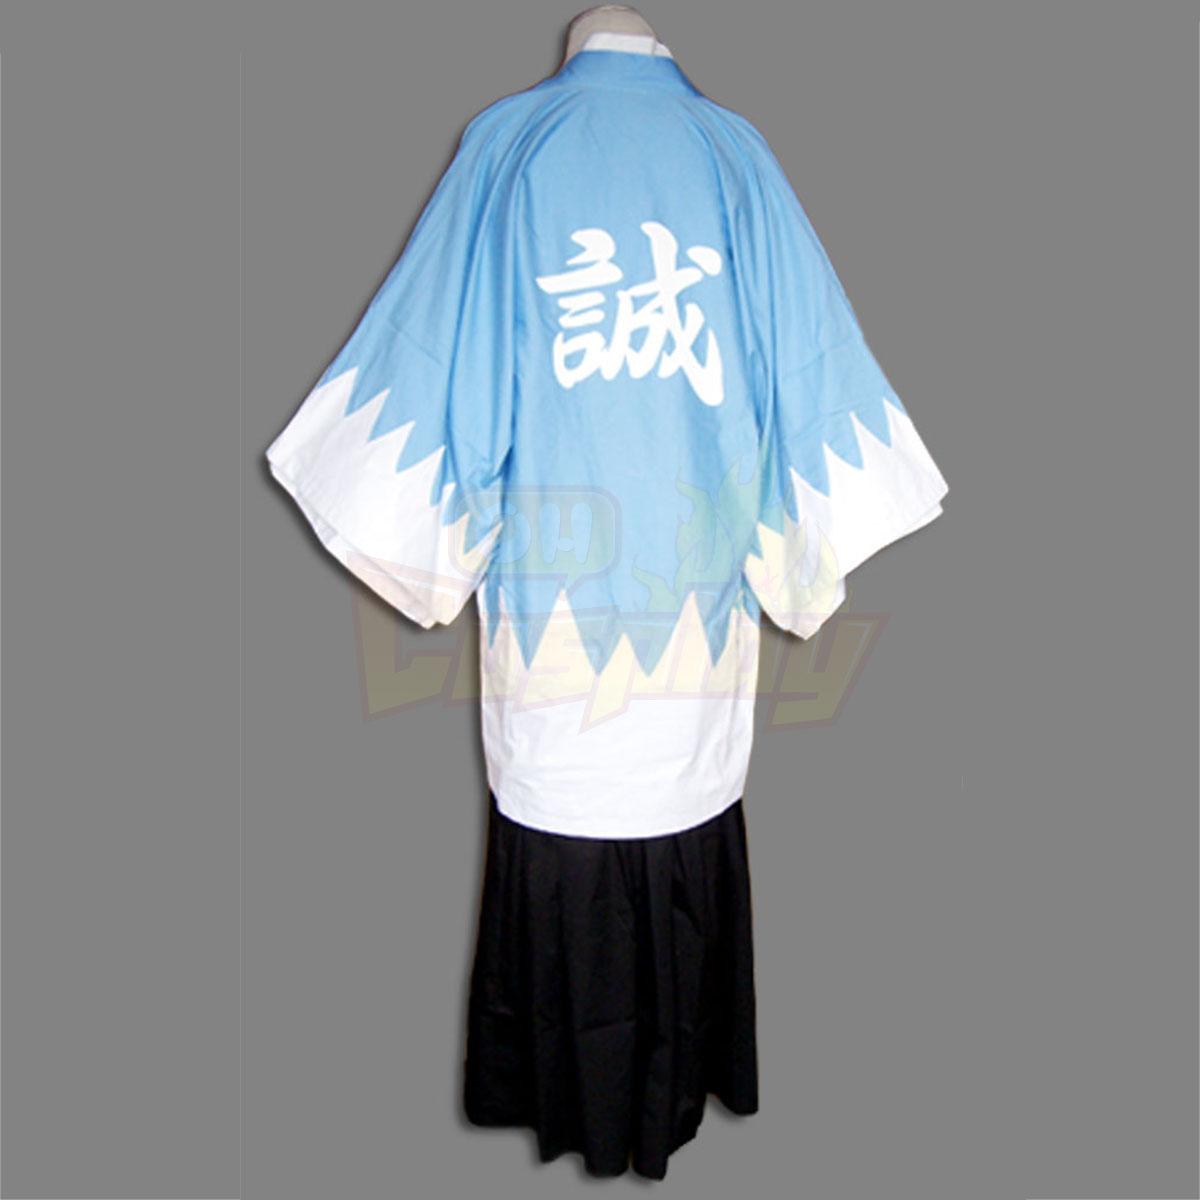 Peacemaker דלוקס Kurogane Okita Souji קוספליי הסייף כחול קוספליי